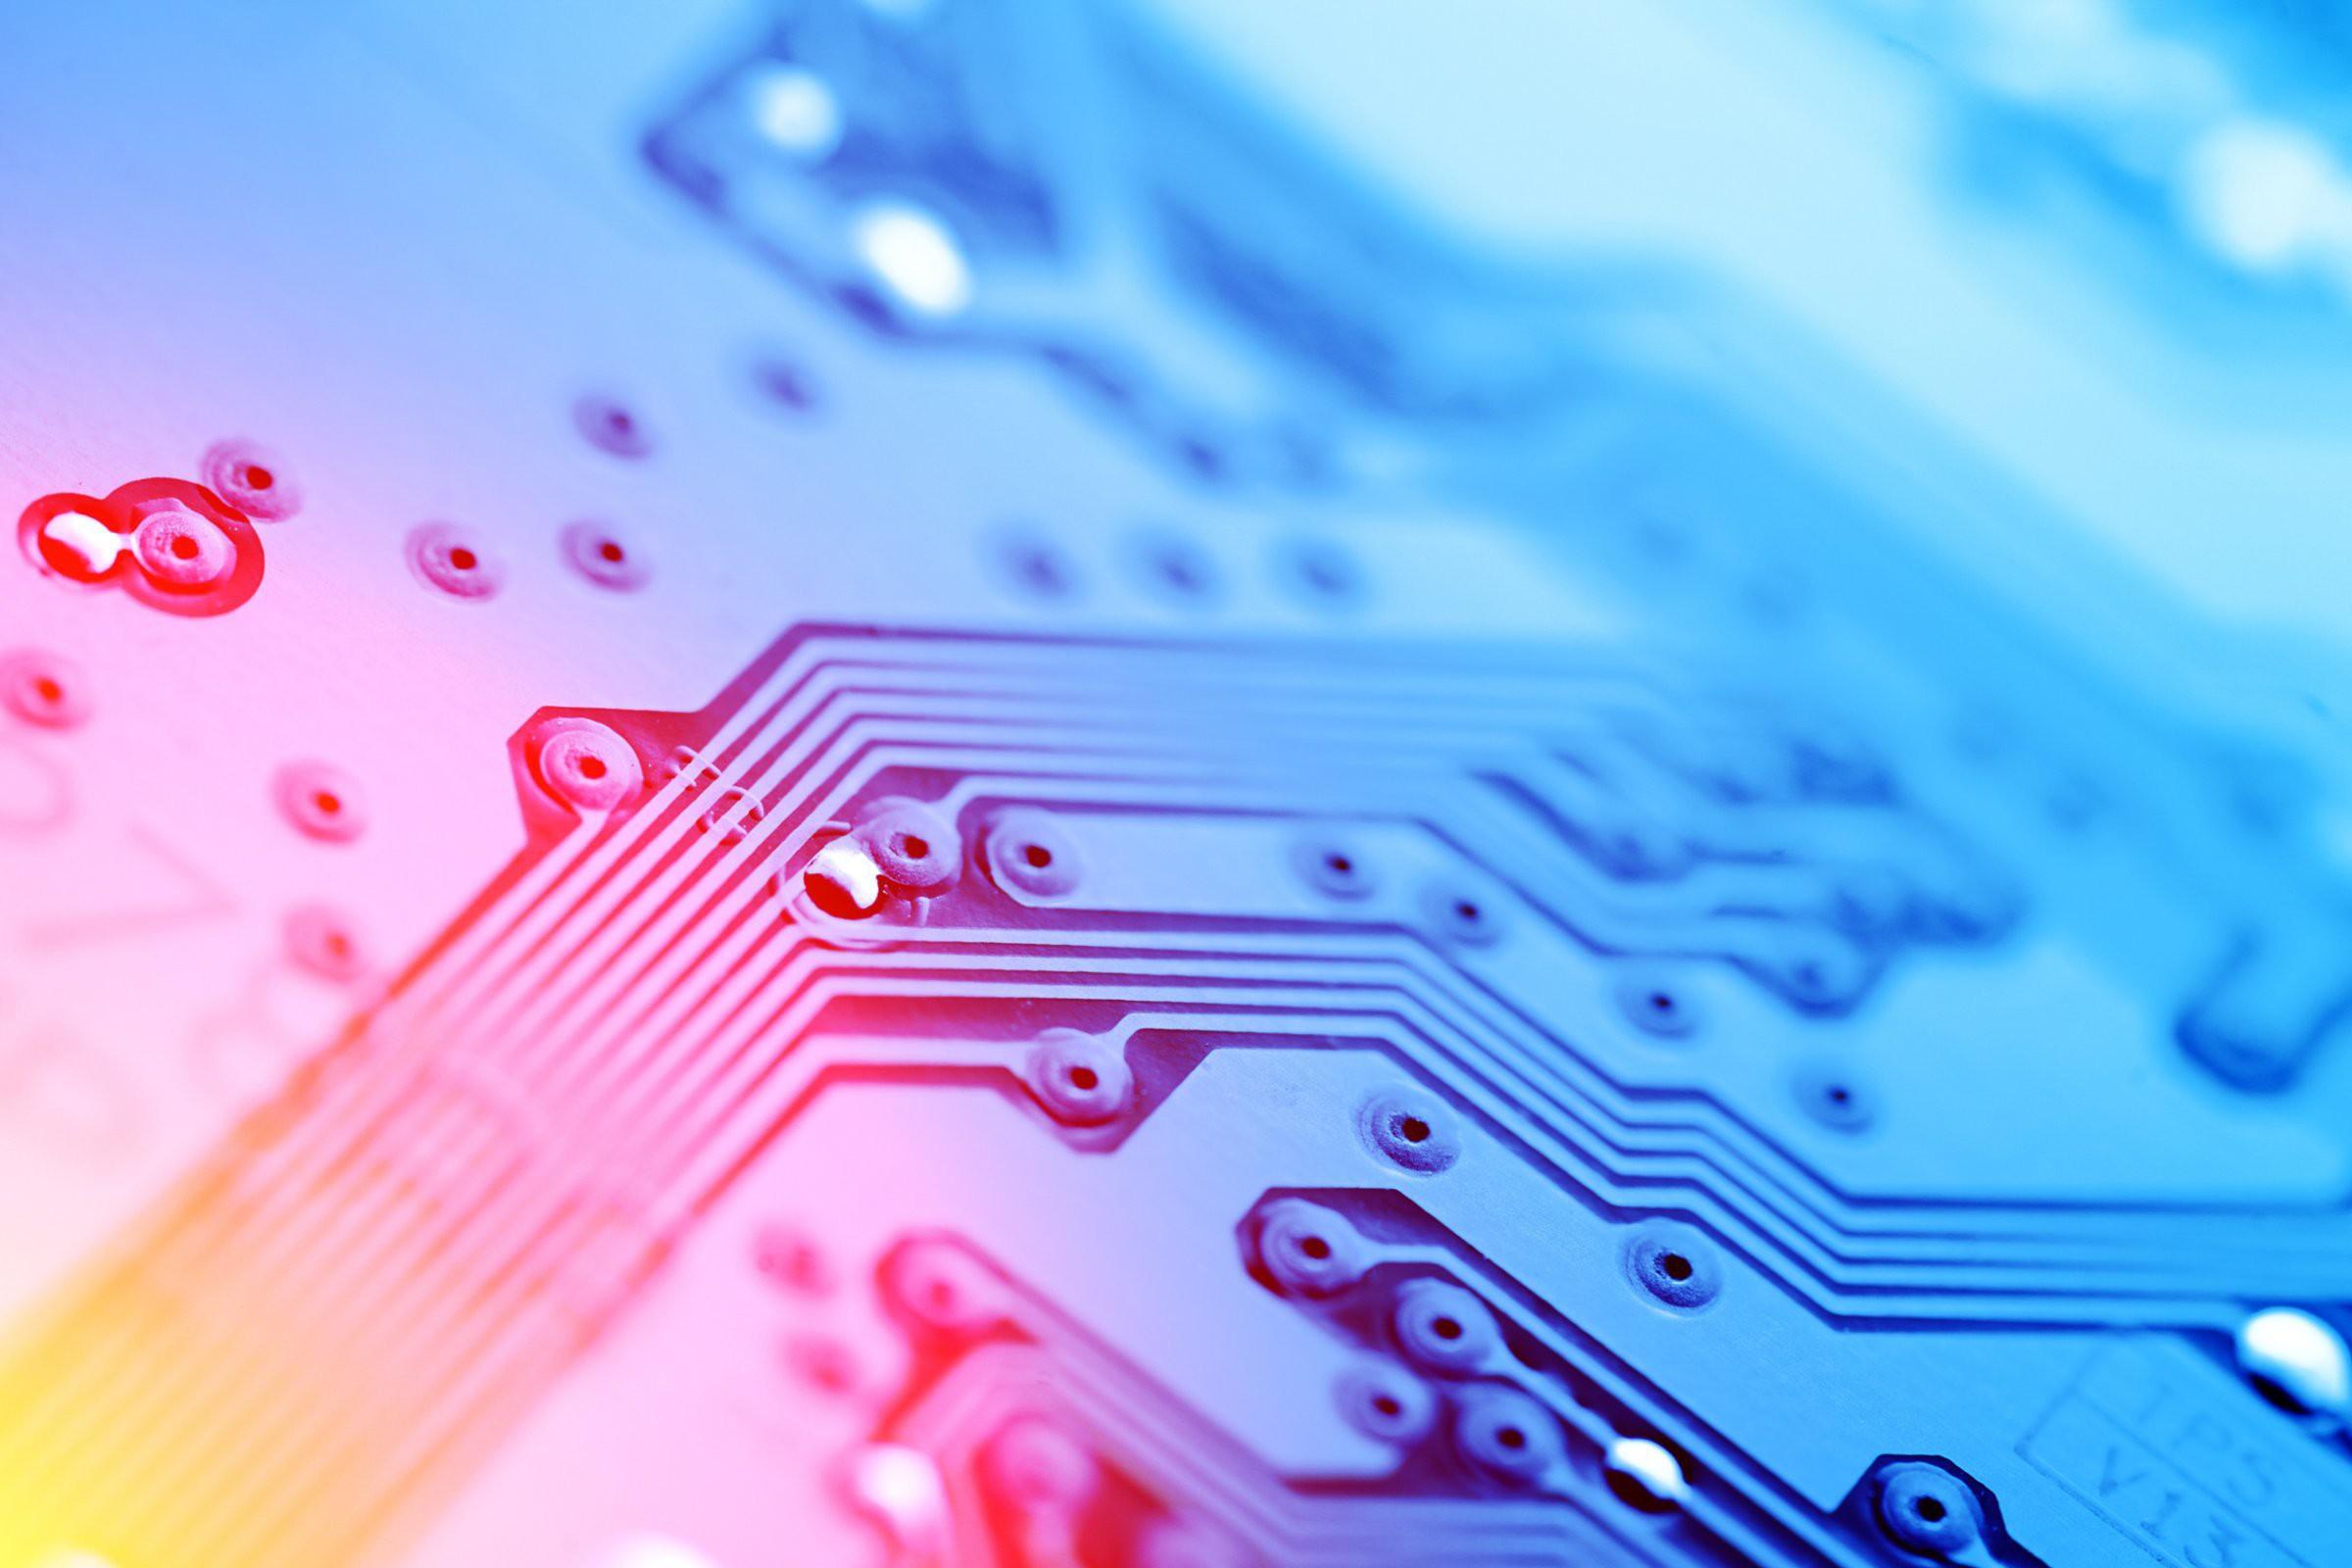 DIY LED Audio Spectrum Analyzer using WS2812B | Hackaday io